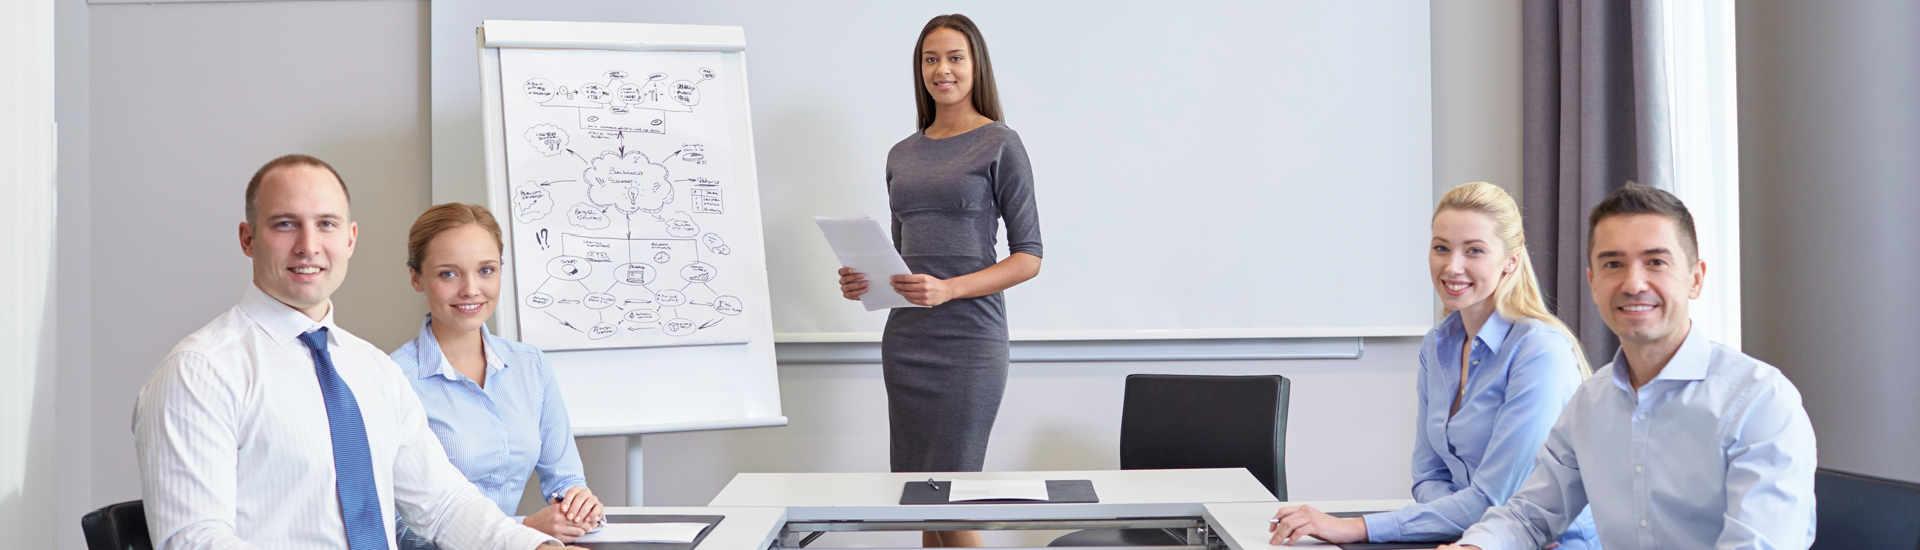 management training leadership training